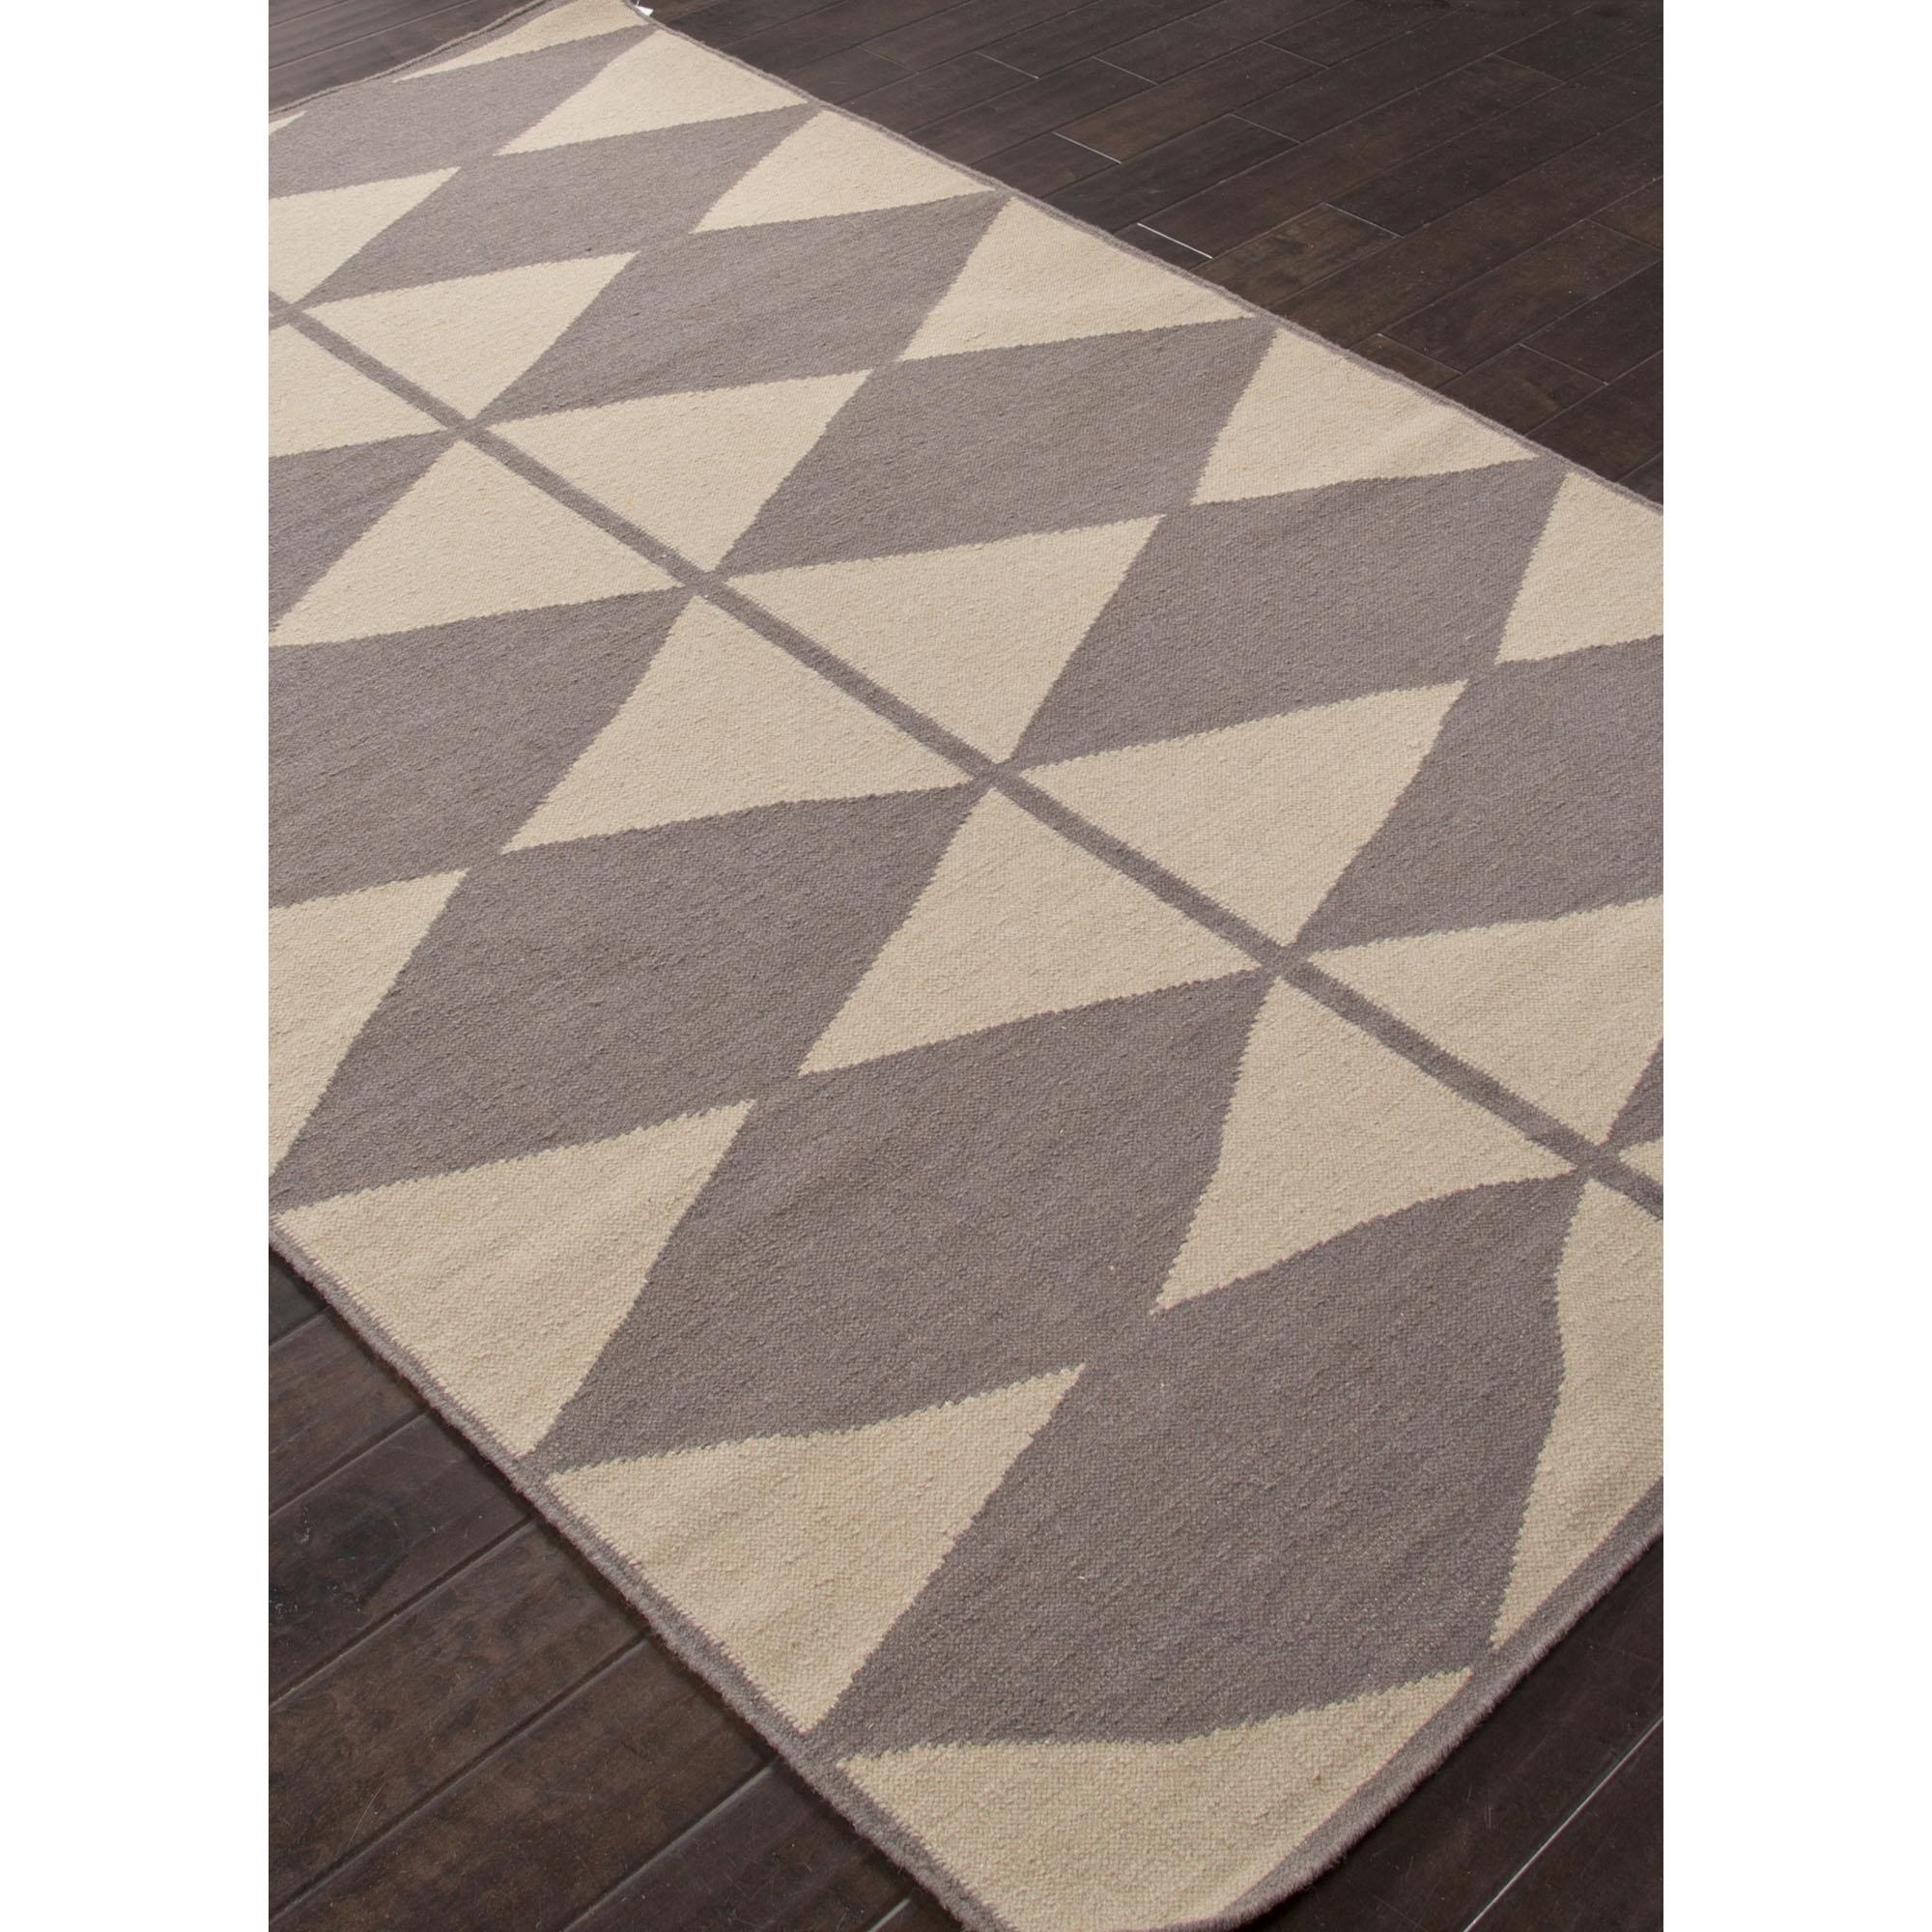 Asterlane Flat Weave Geometric Pattern Grayivory Wool Area Rug Inside 4×6 Wool Area Rugs (#2 of 15)